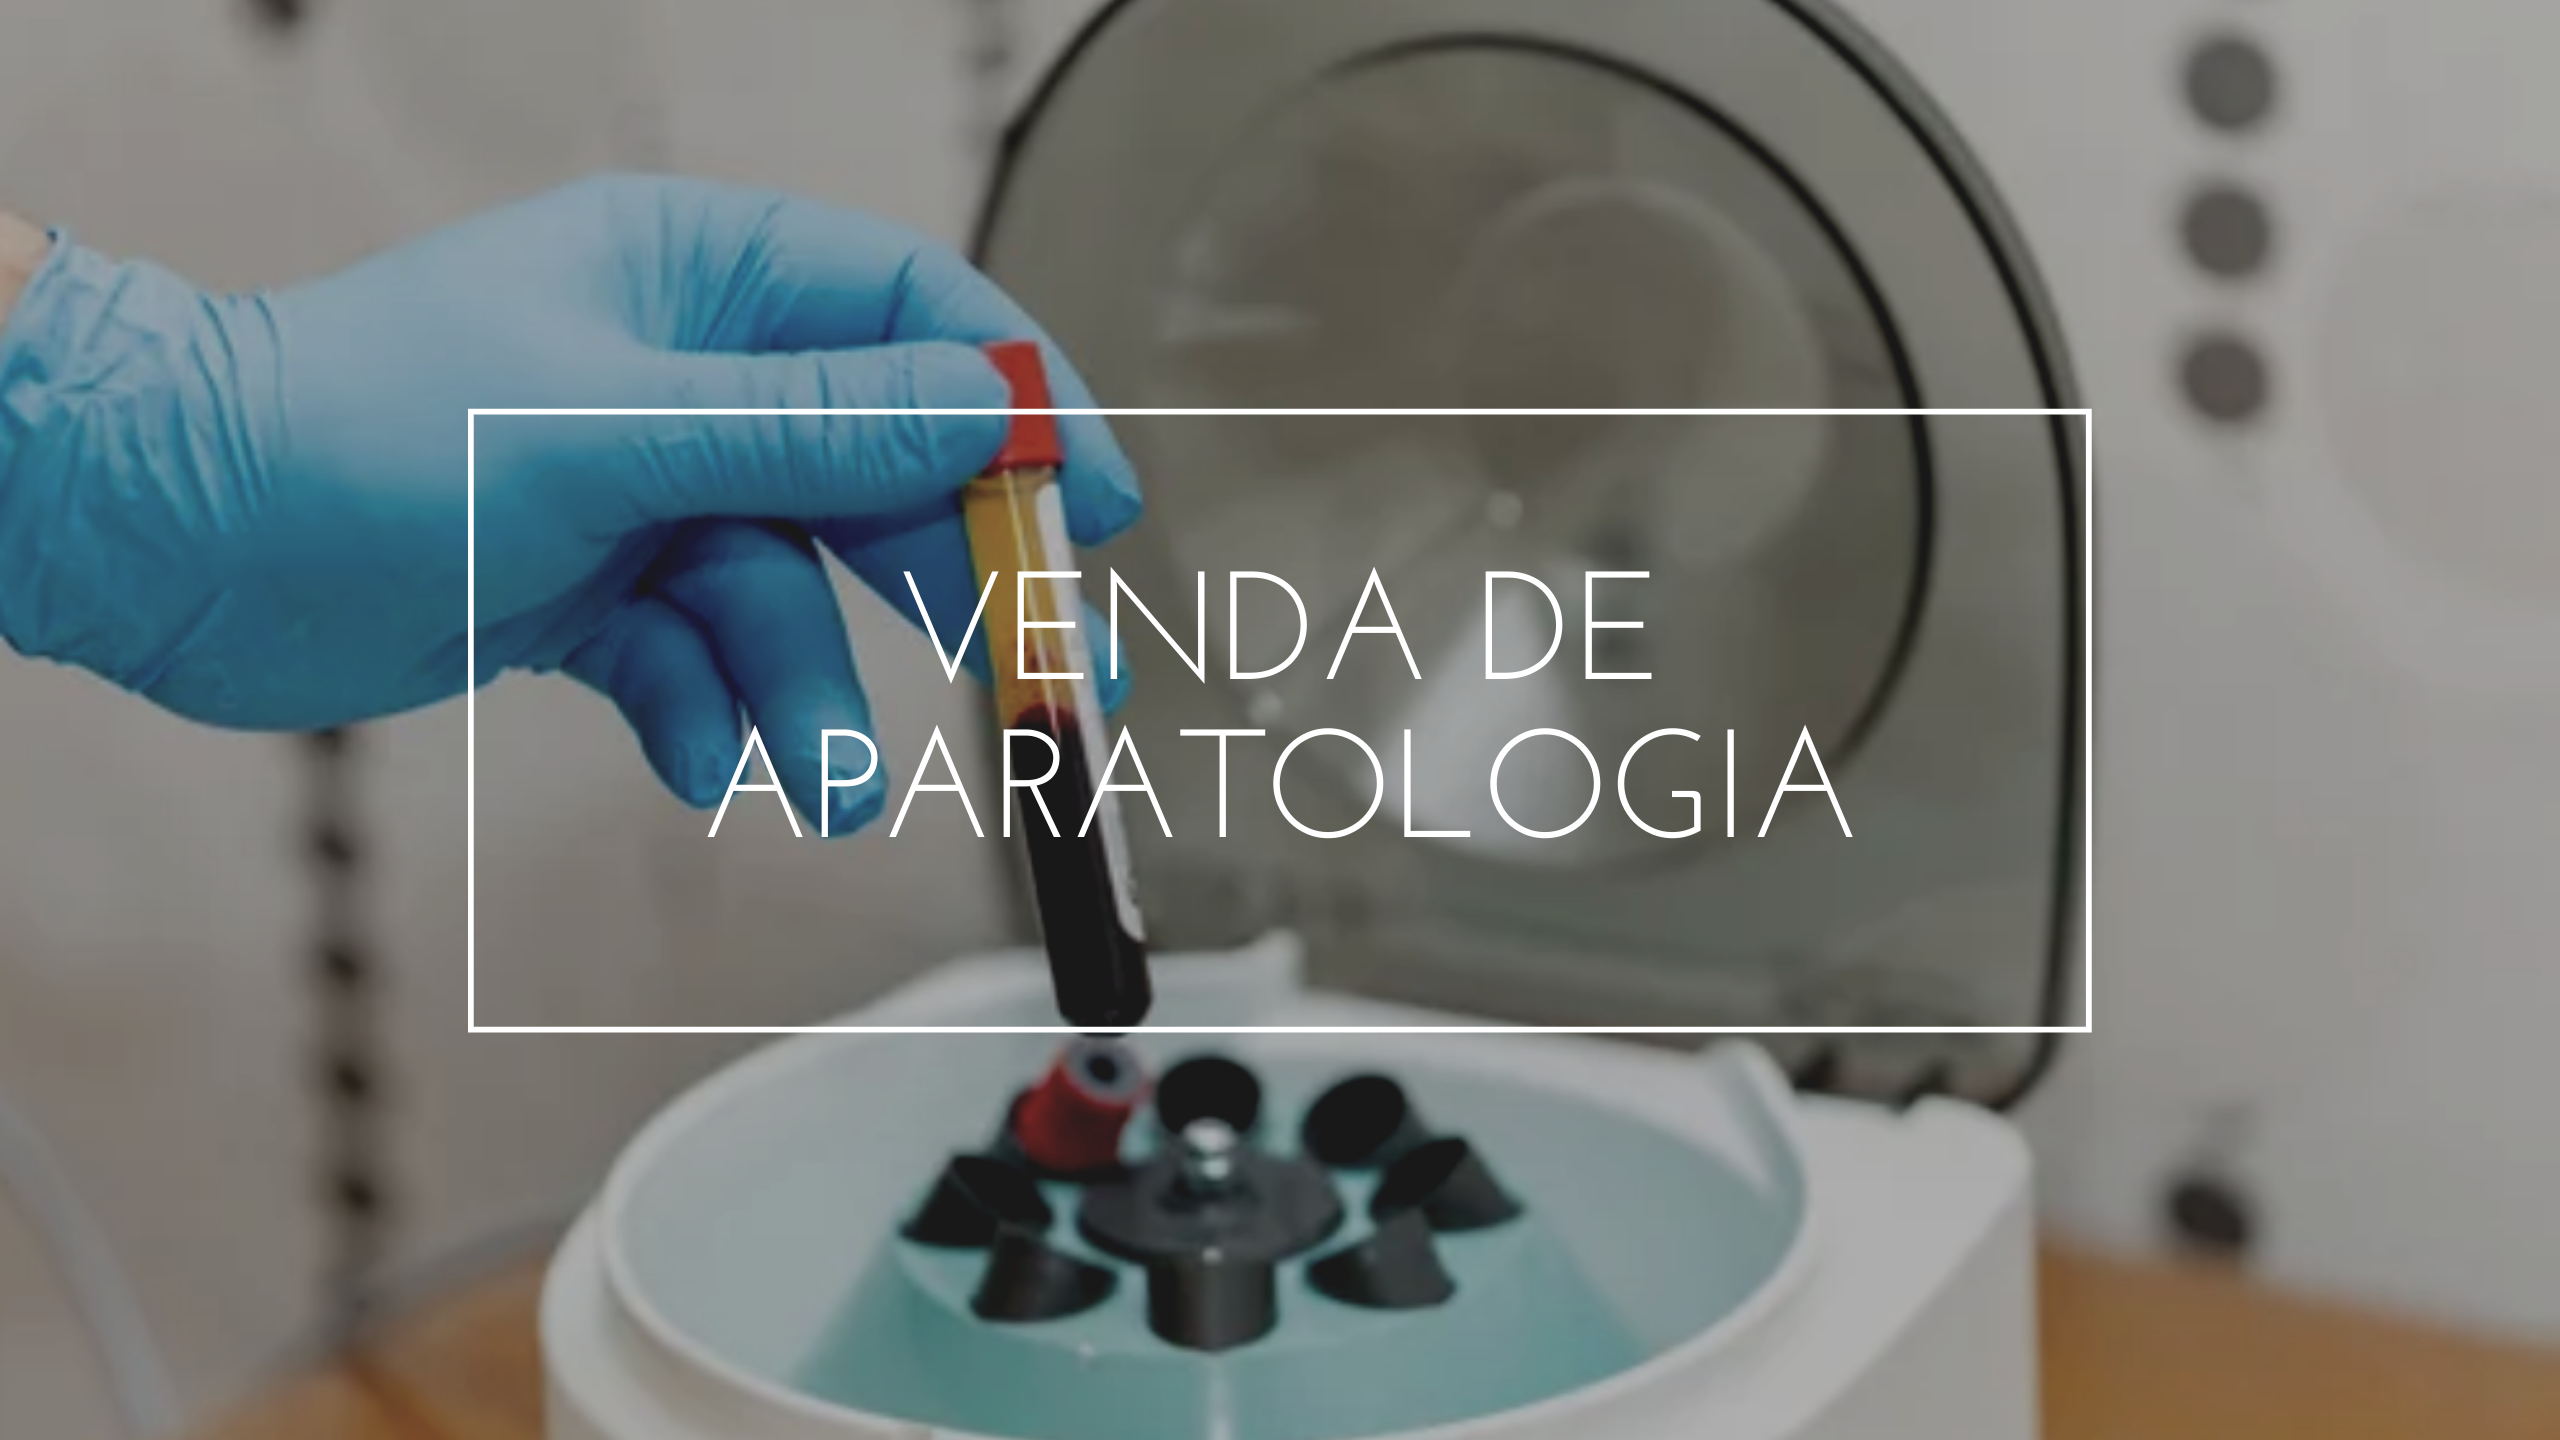 VENDA DE APARATOLOGIA